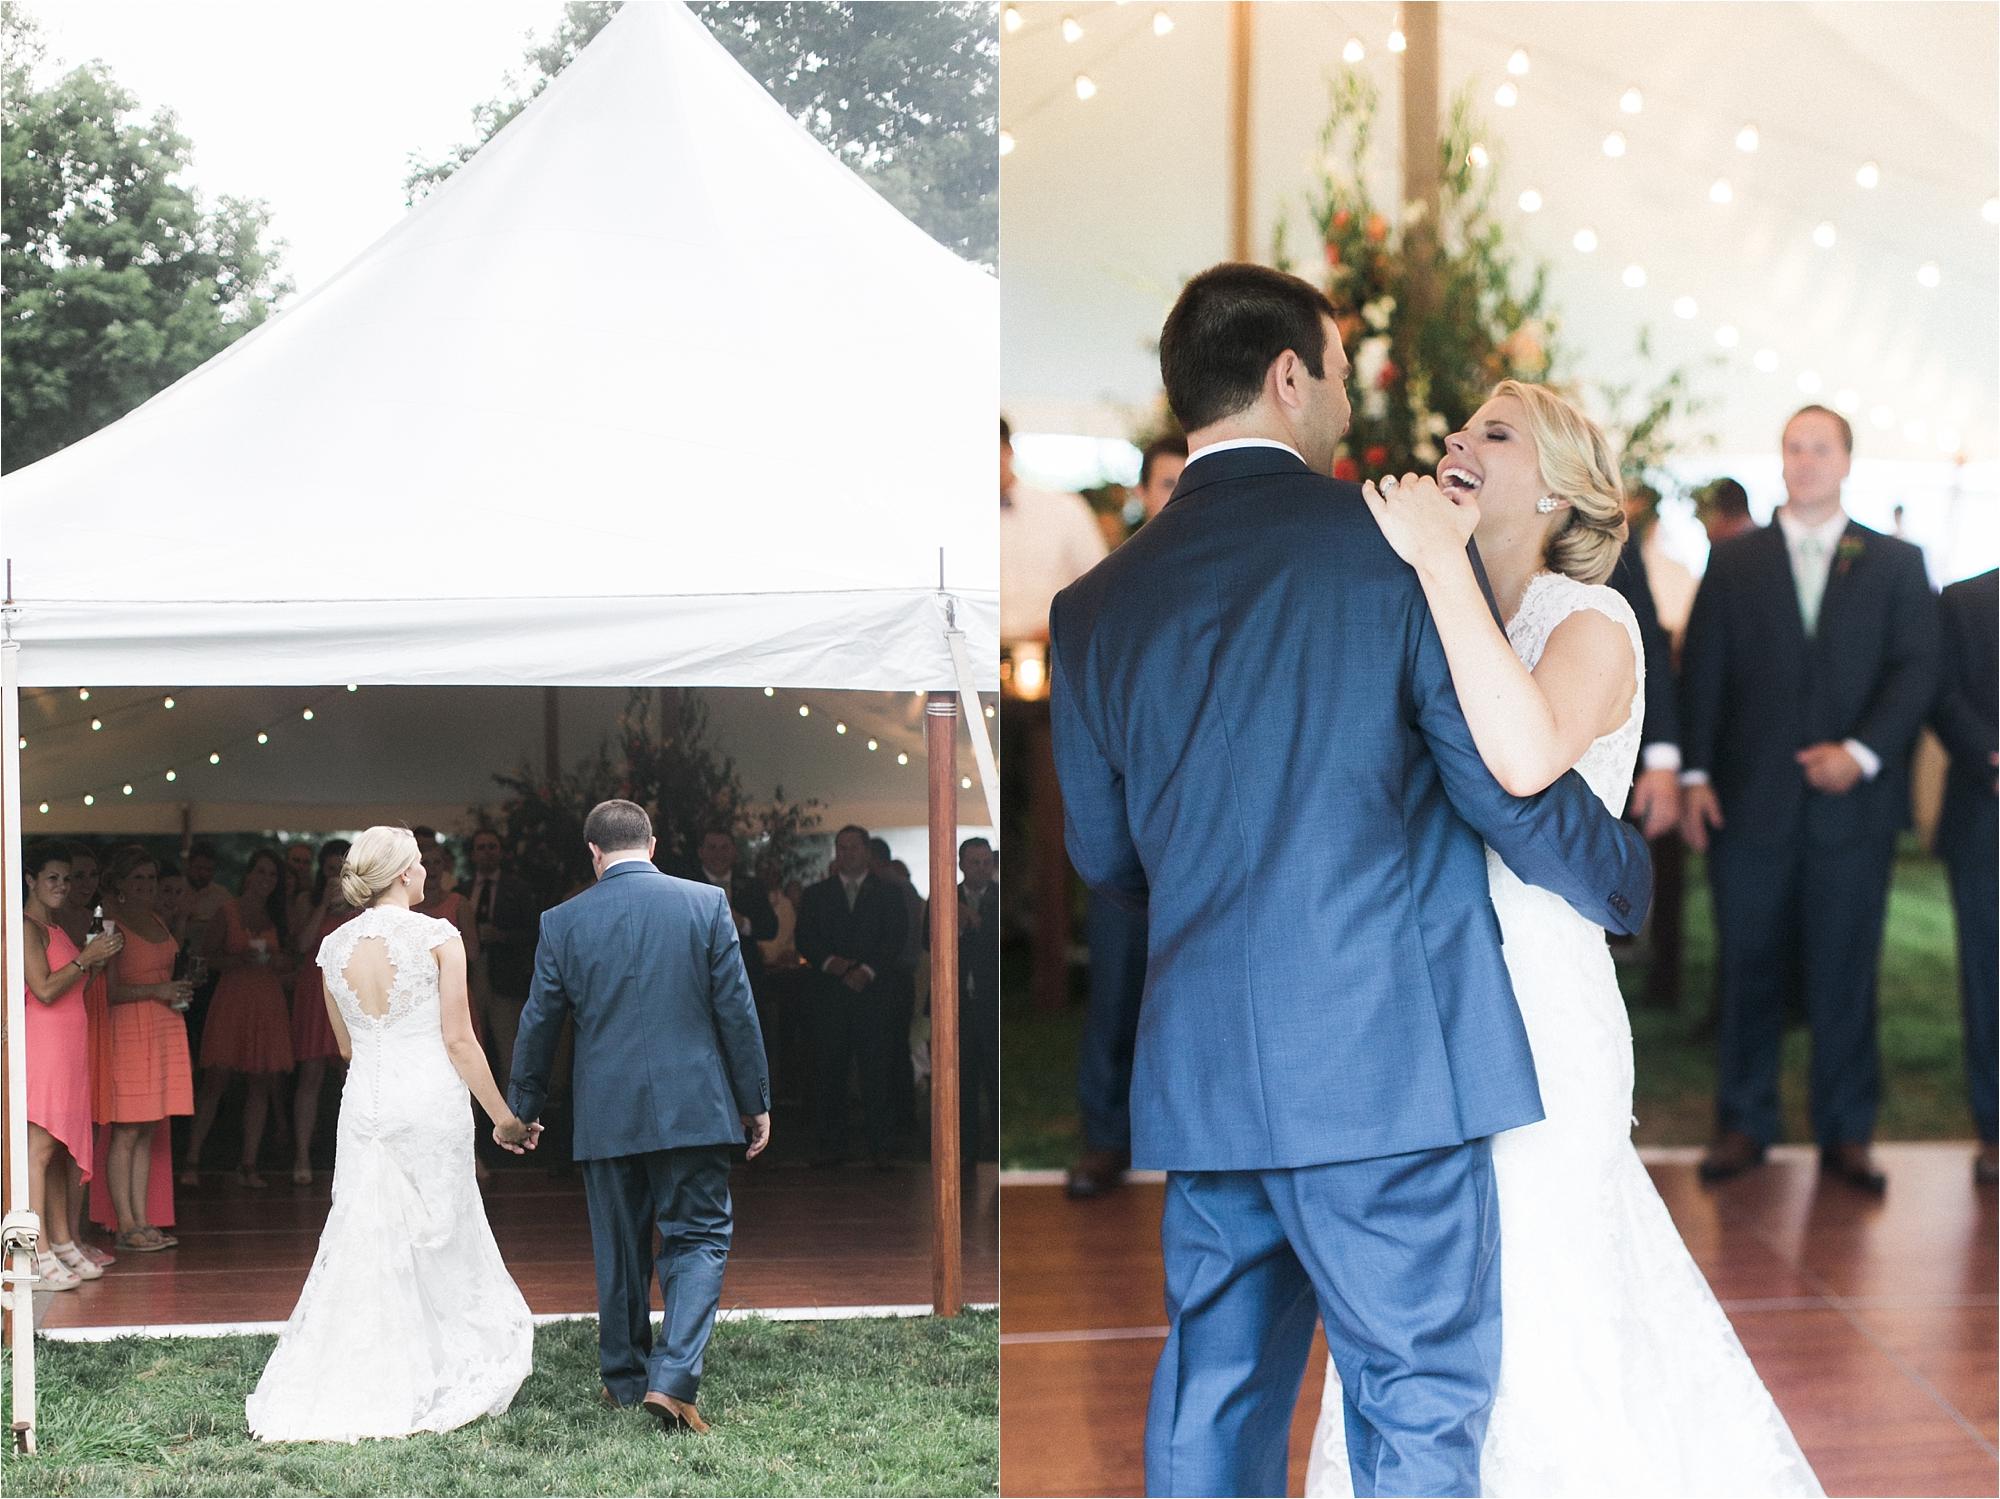 richmond-virginia-tuckahoe-plantation-coral-summer-wedding-stephanie-yonce-photos_0058.jpg